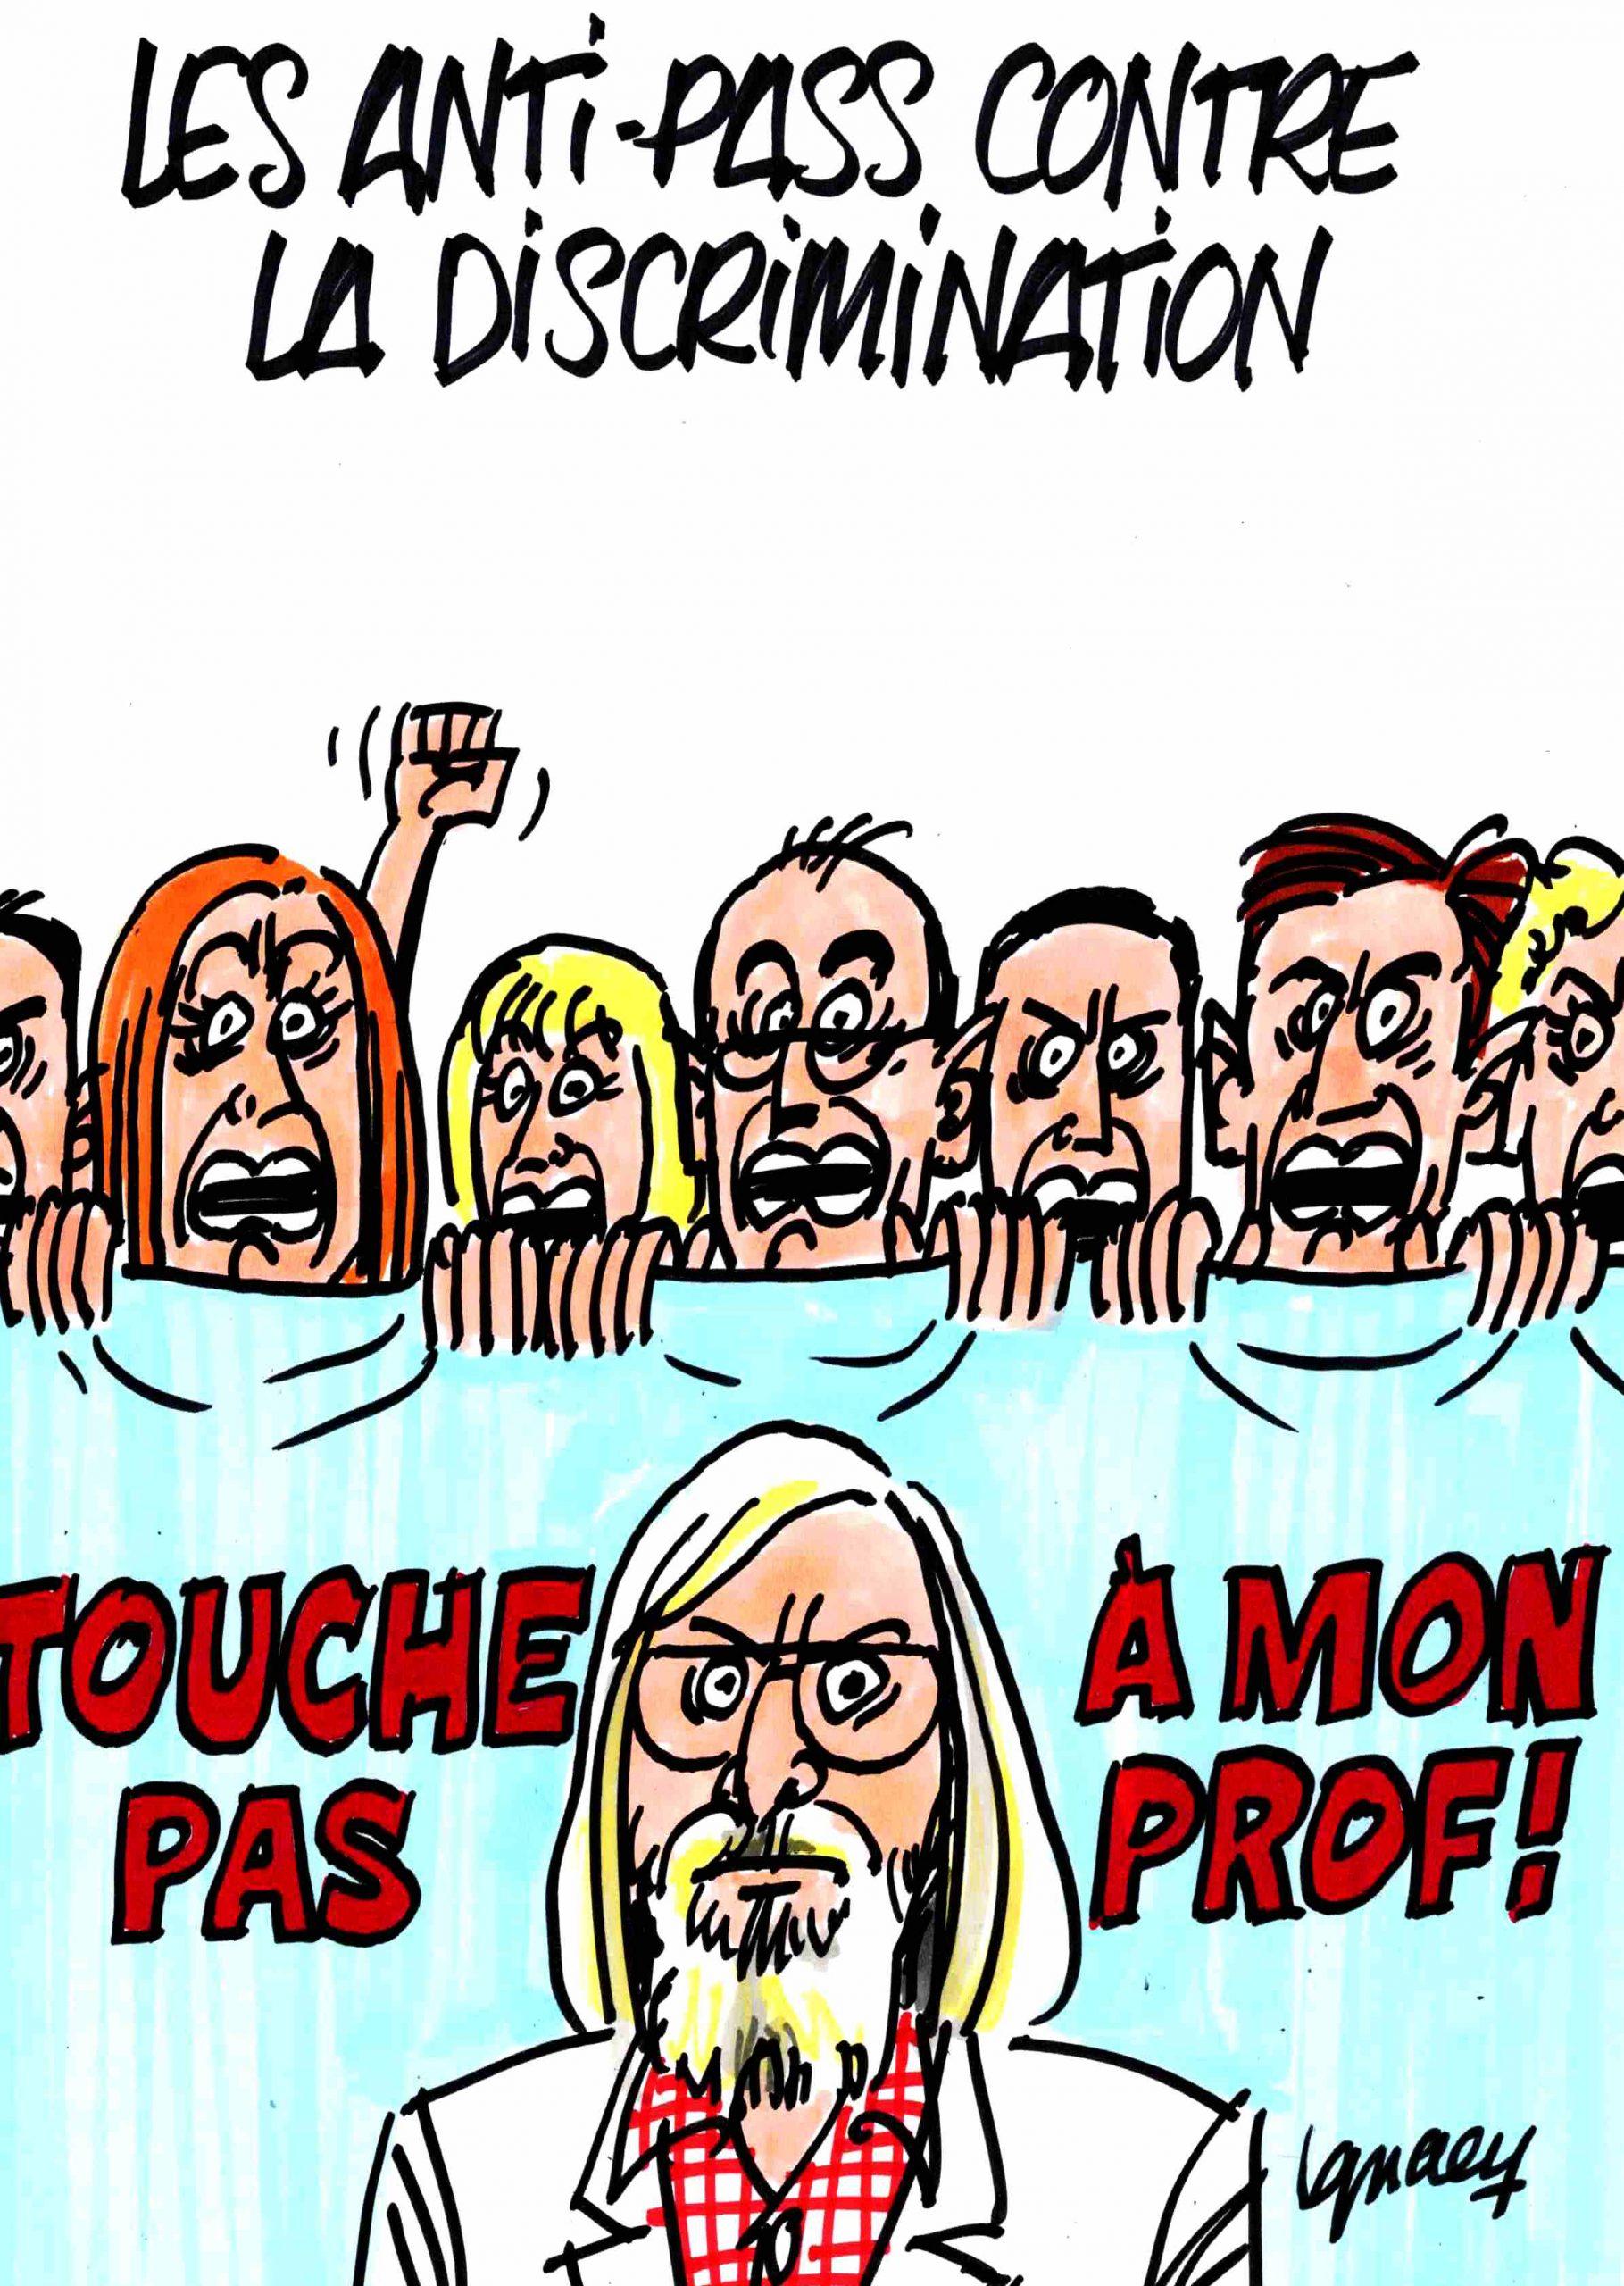 Ignace - Les anti-pass contre la discrimination